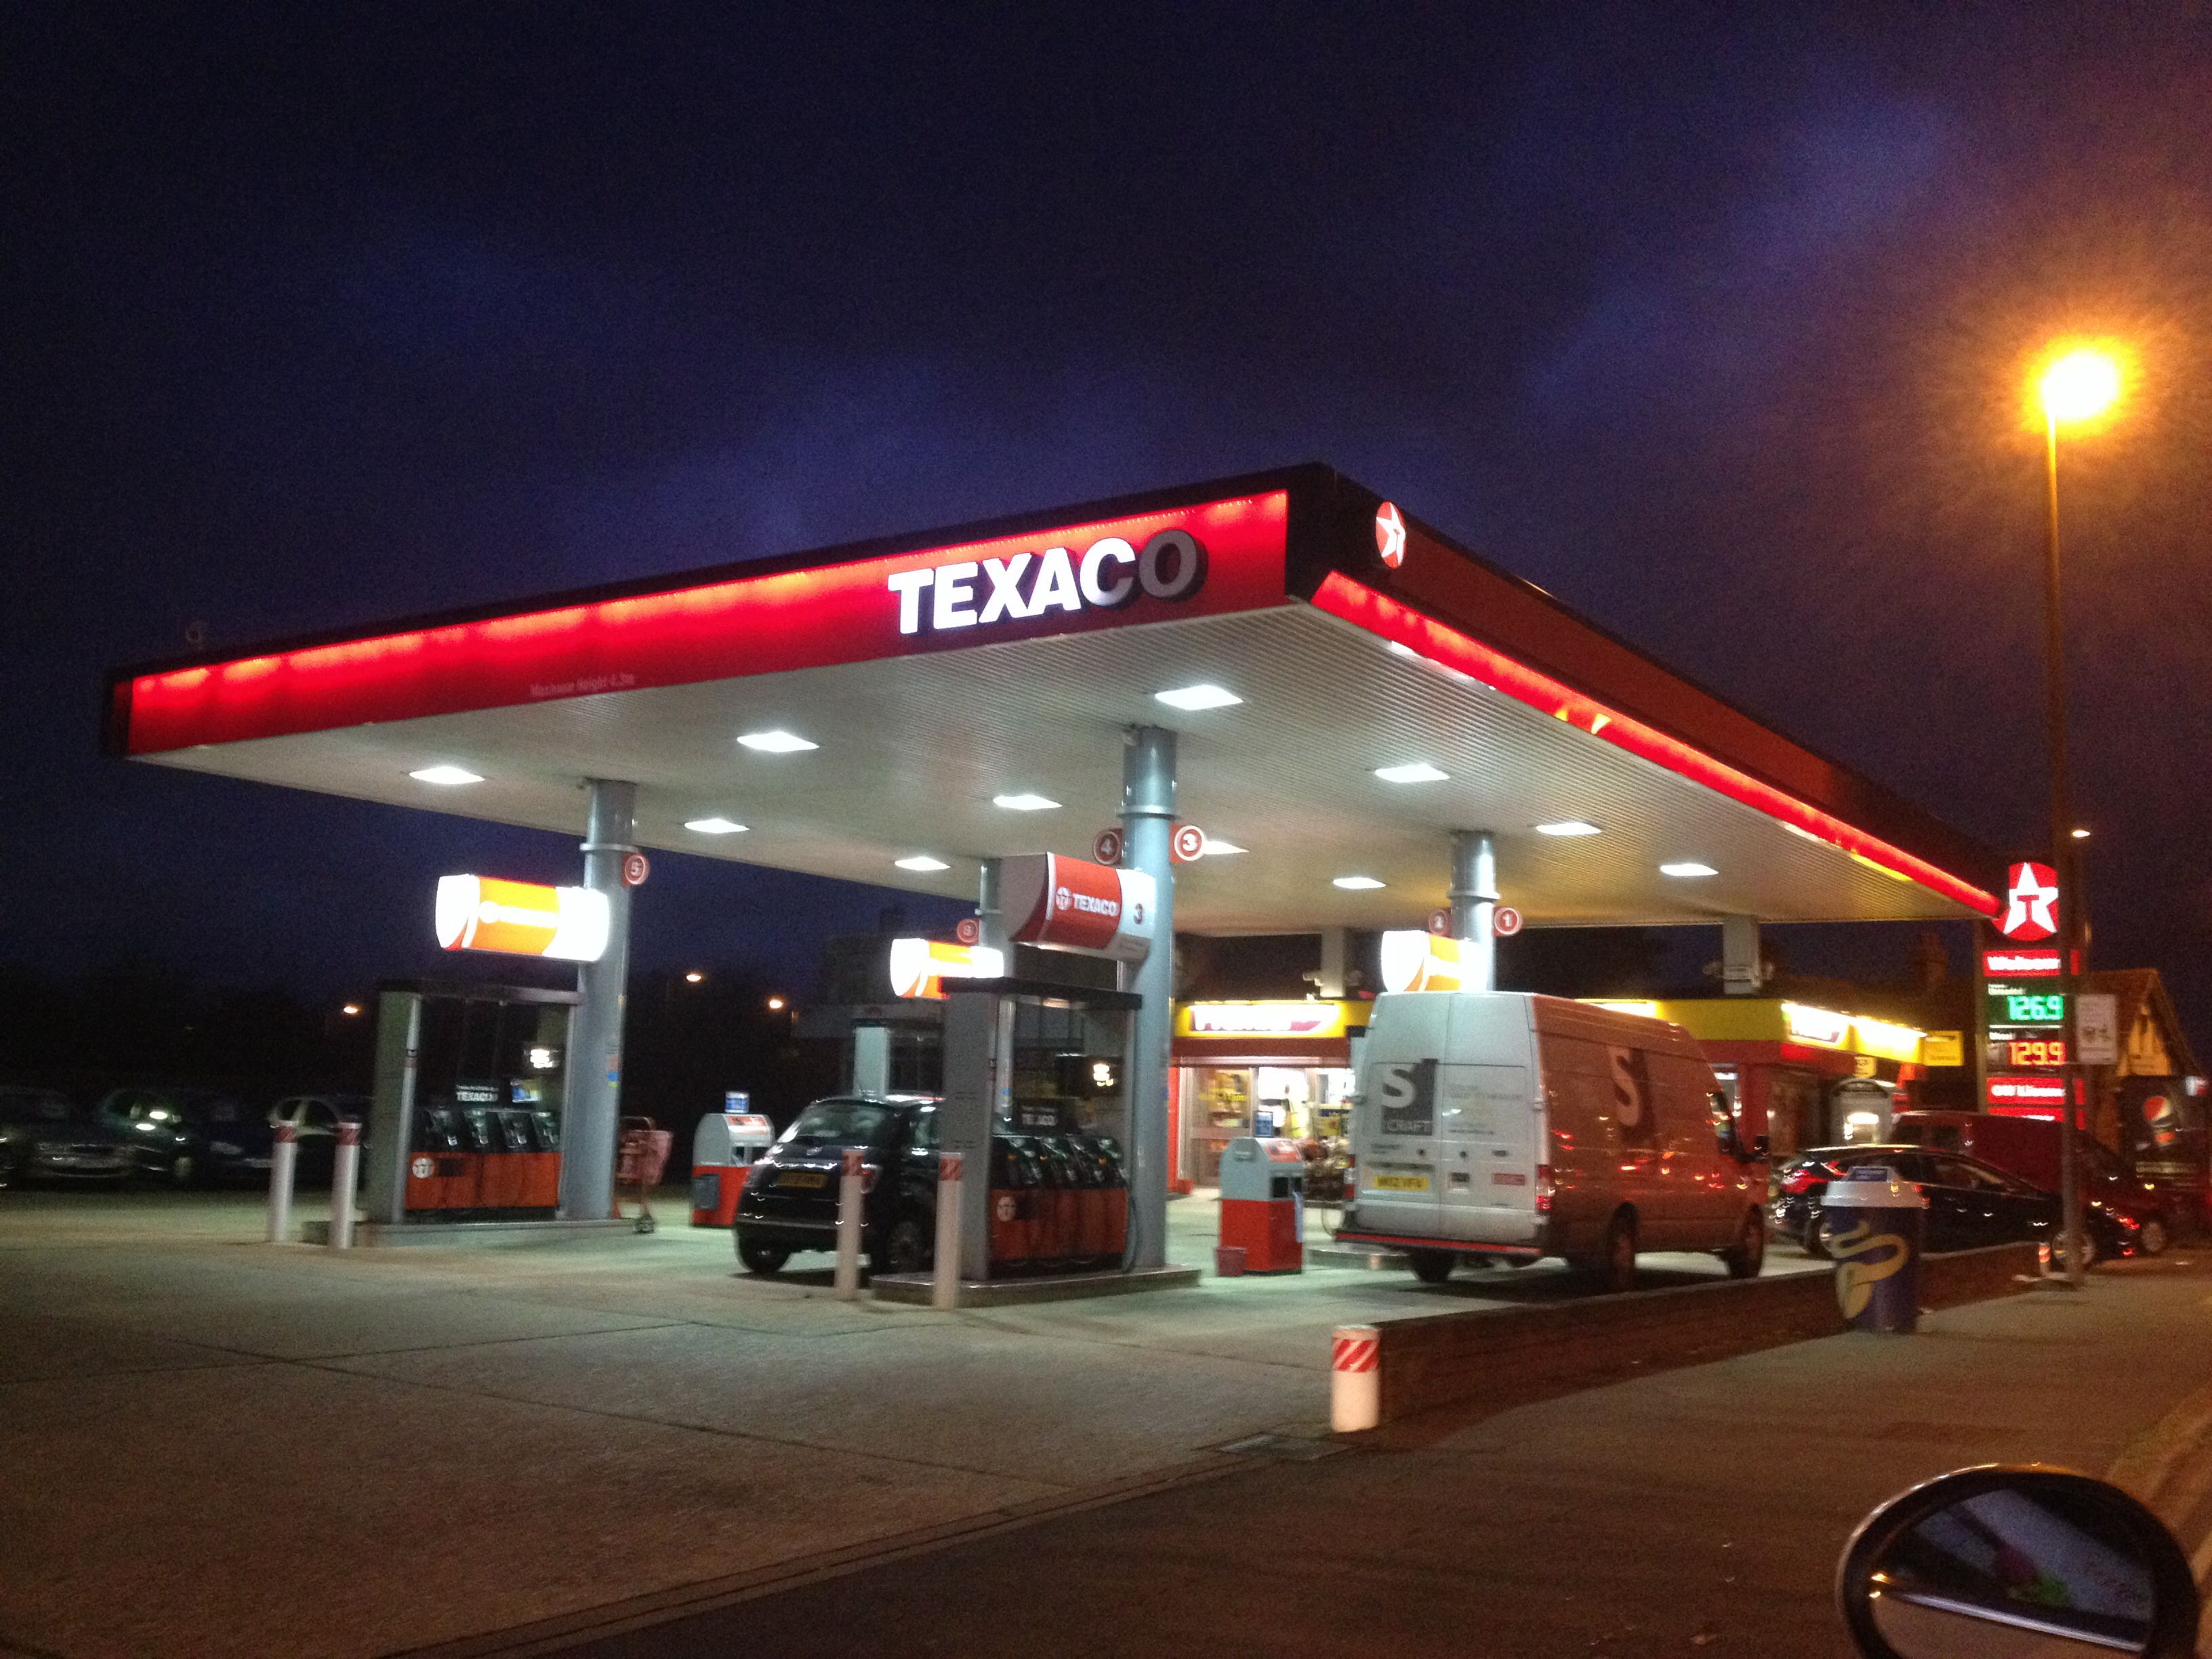 Free photo: Texaco Petrol Station - Shop, Station, Pump